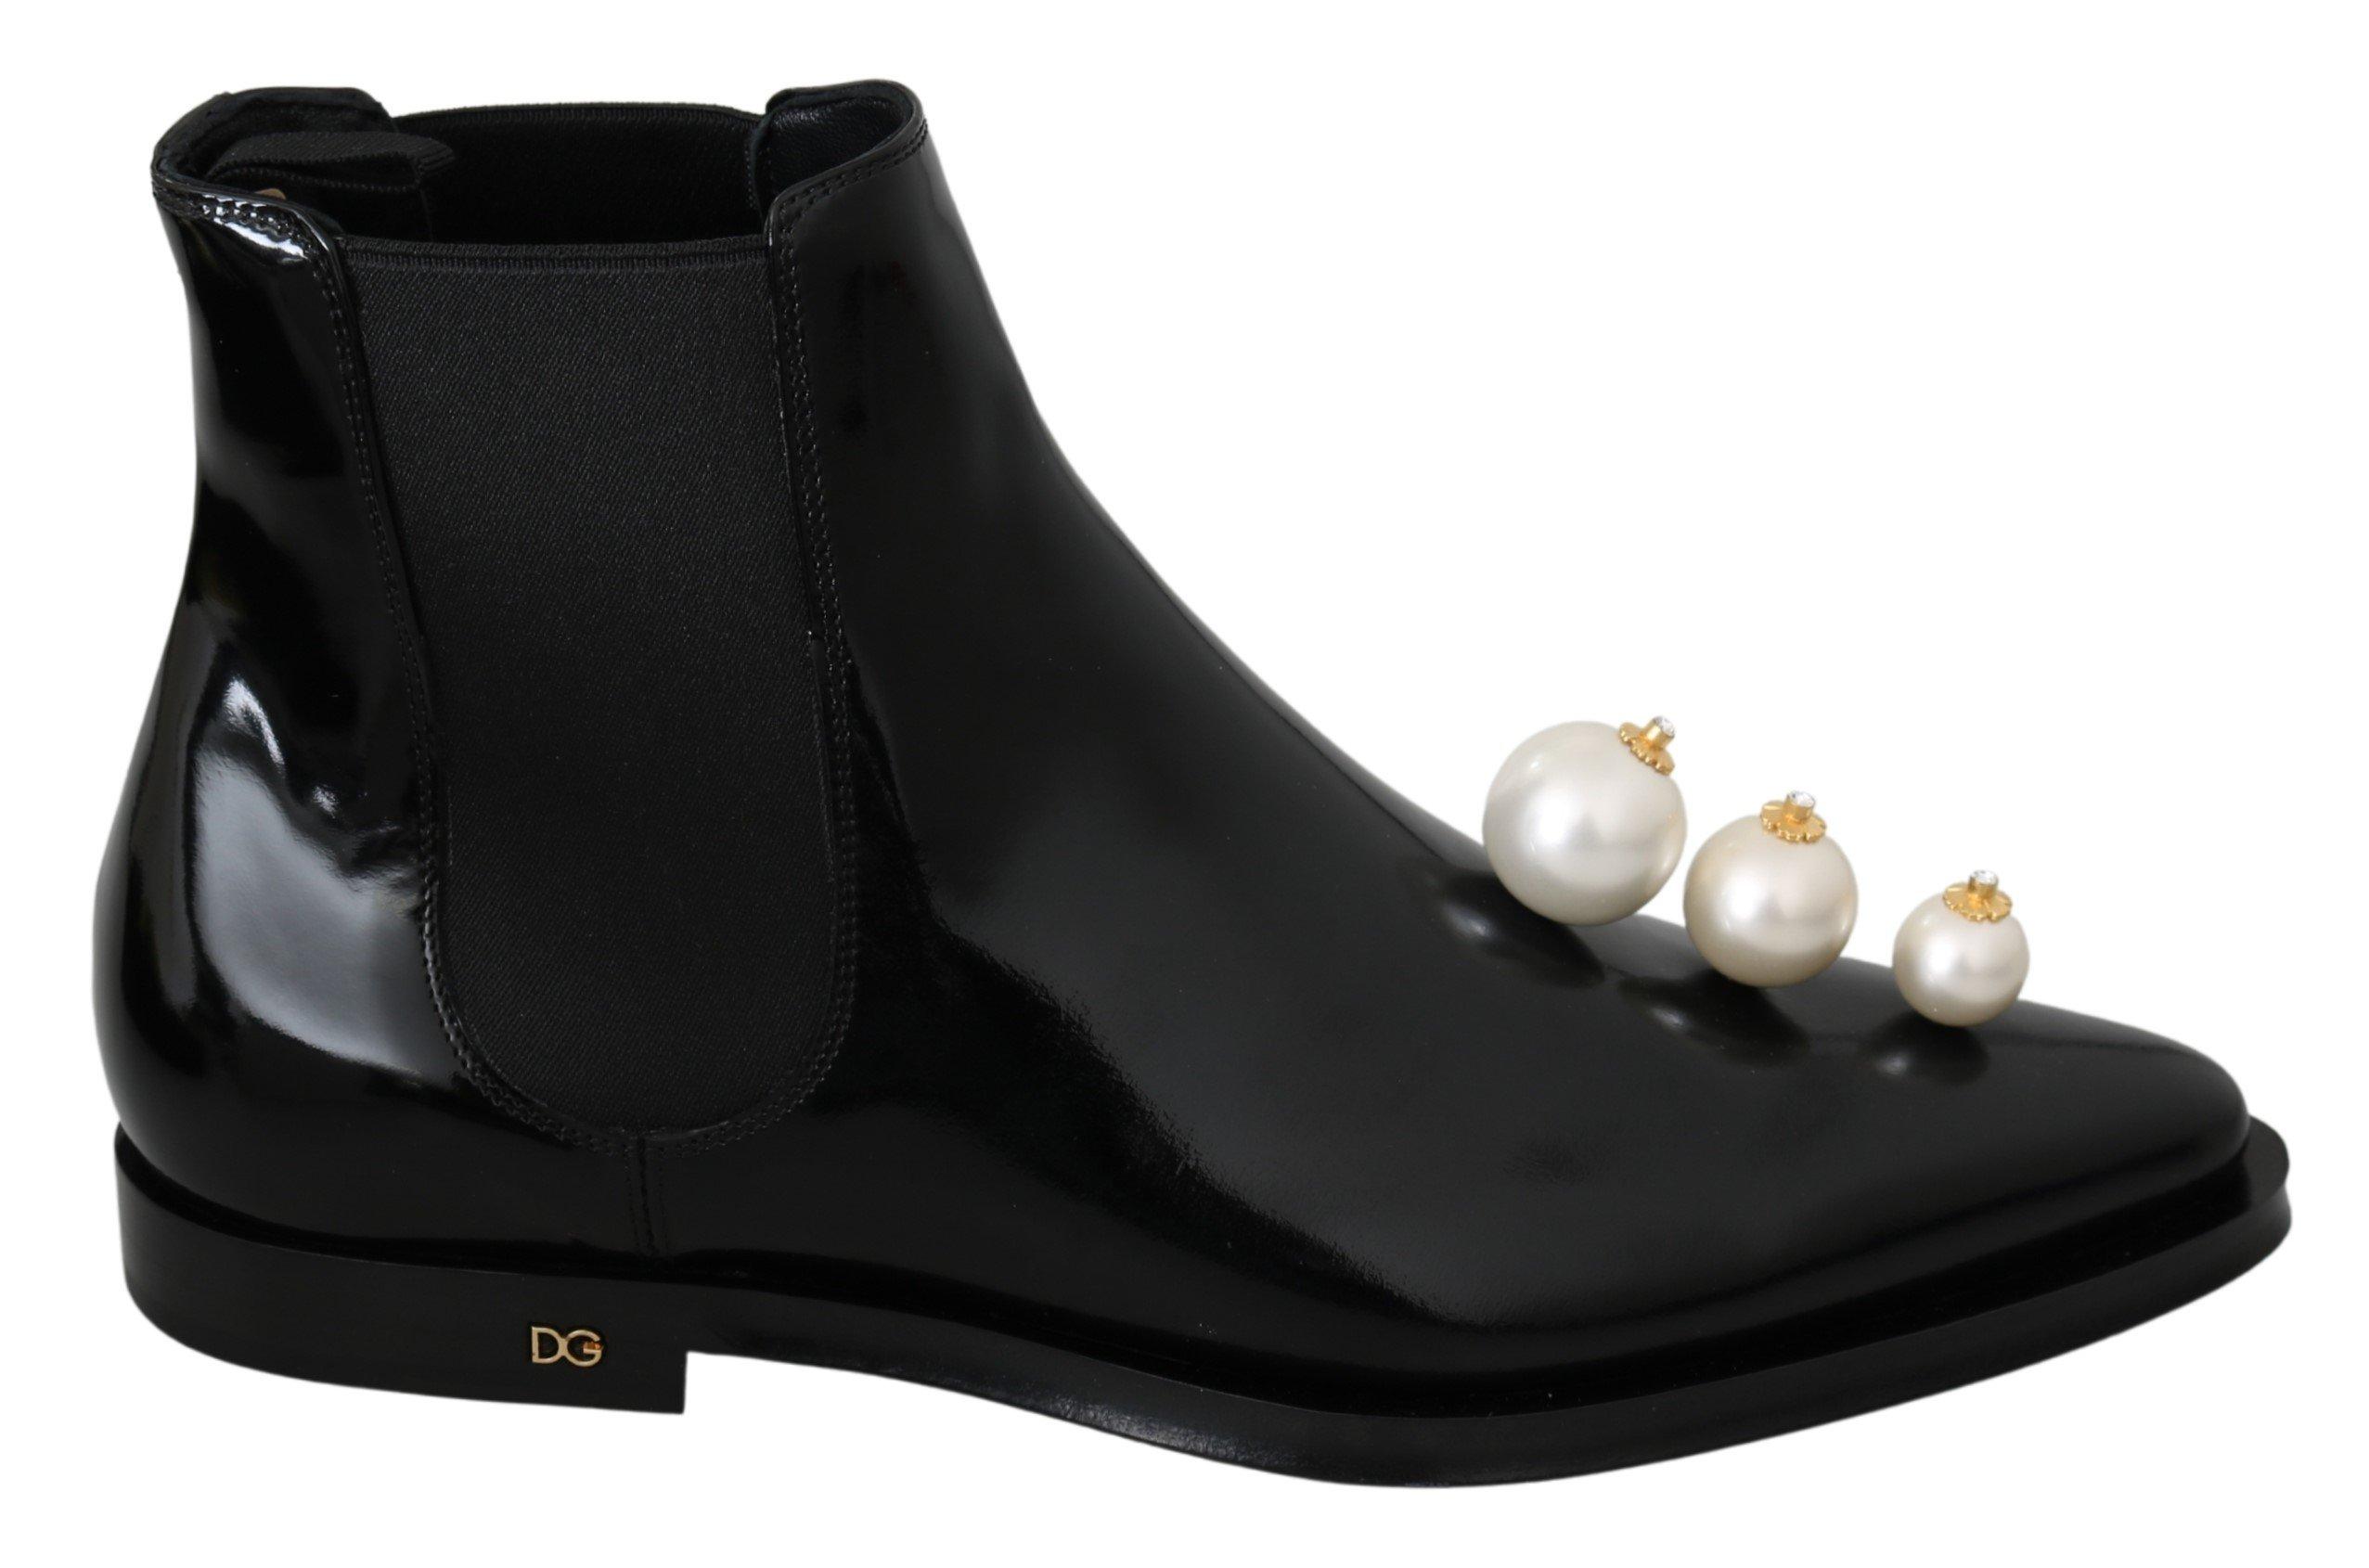 Dolce & Gabbana Women's Leather Pearls Ankle High Boot Black LA6914 - EU39/US8.5